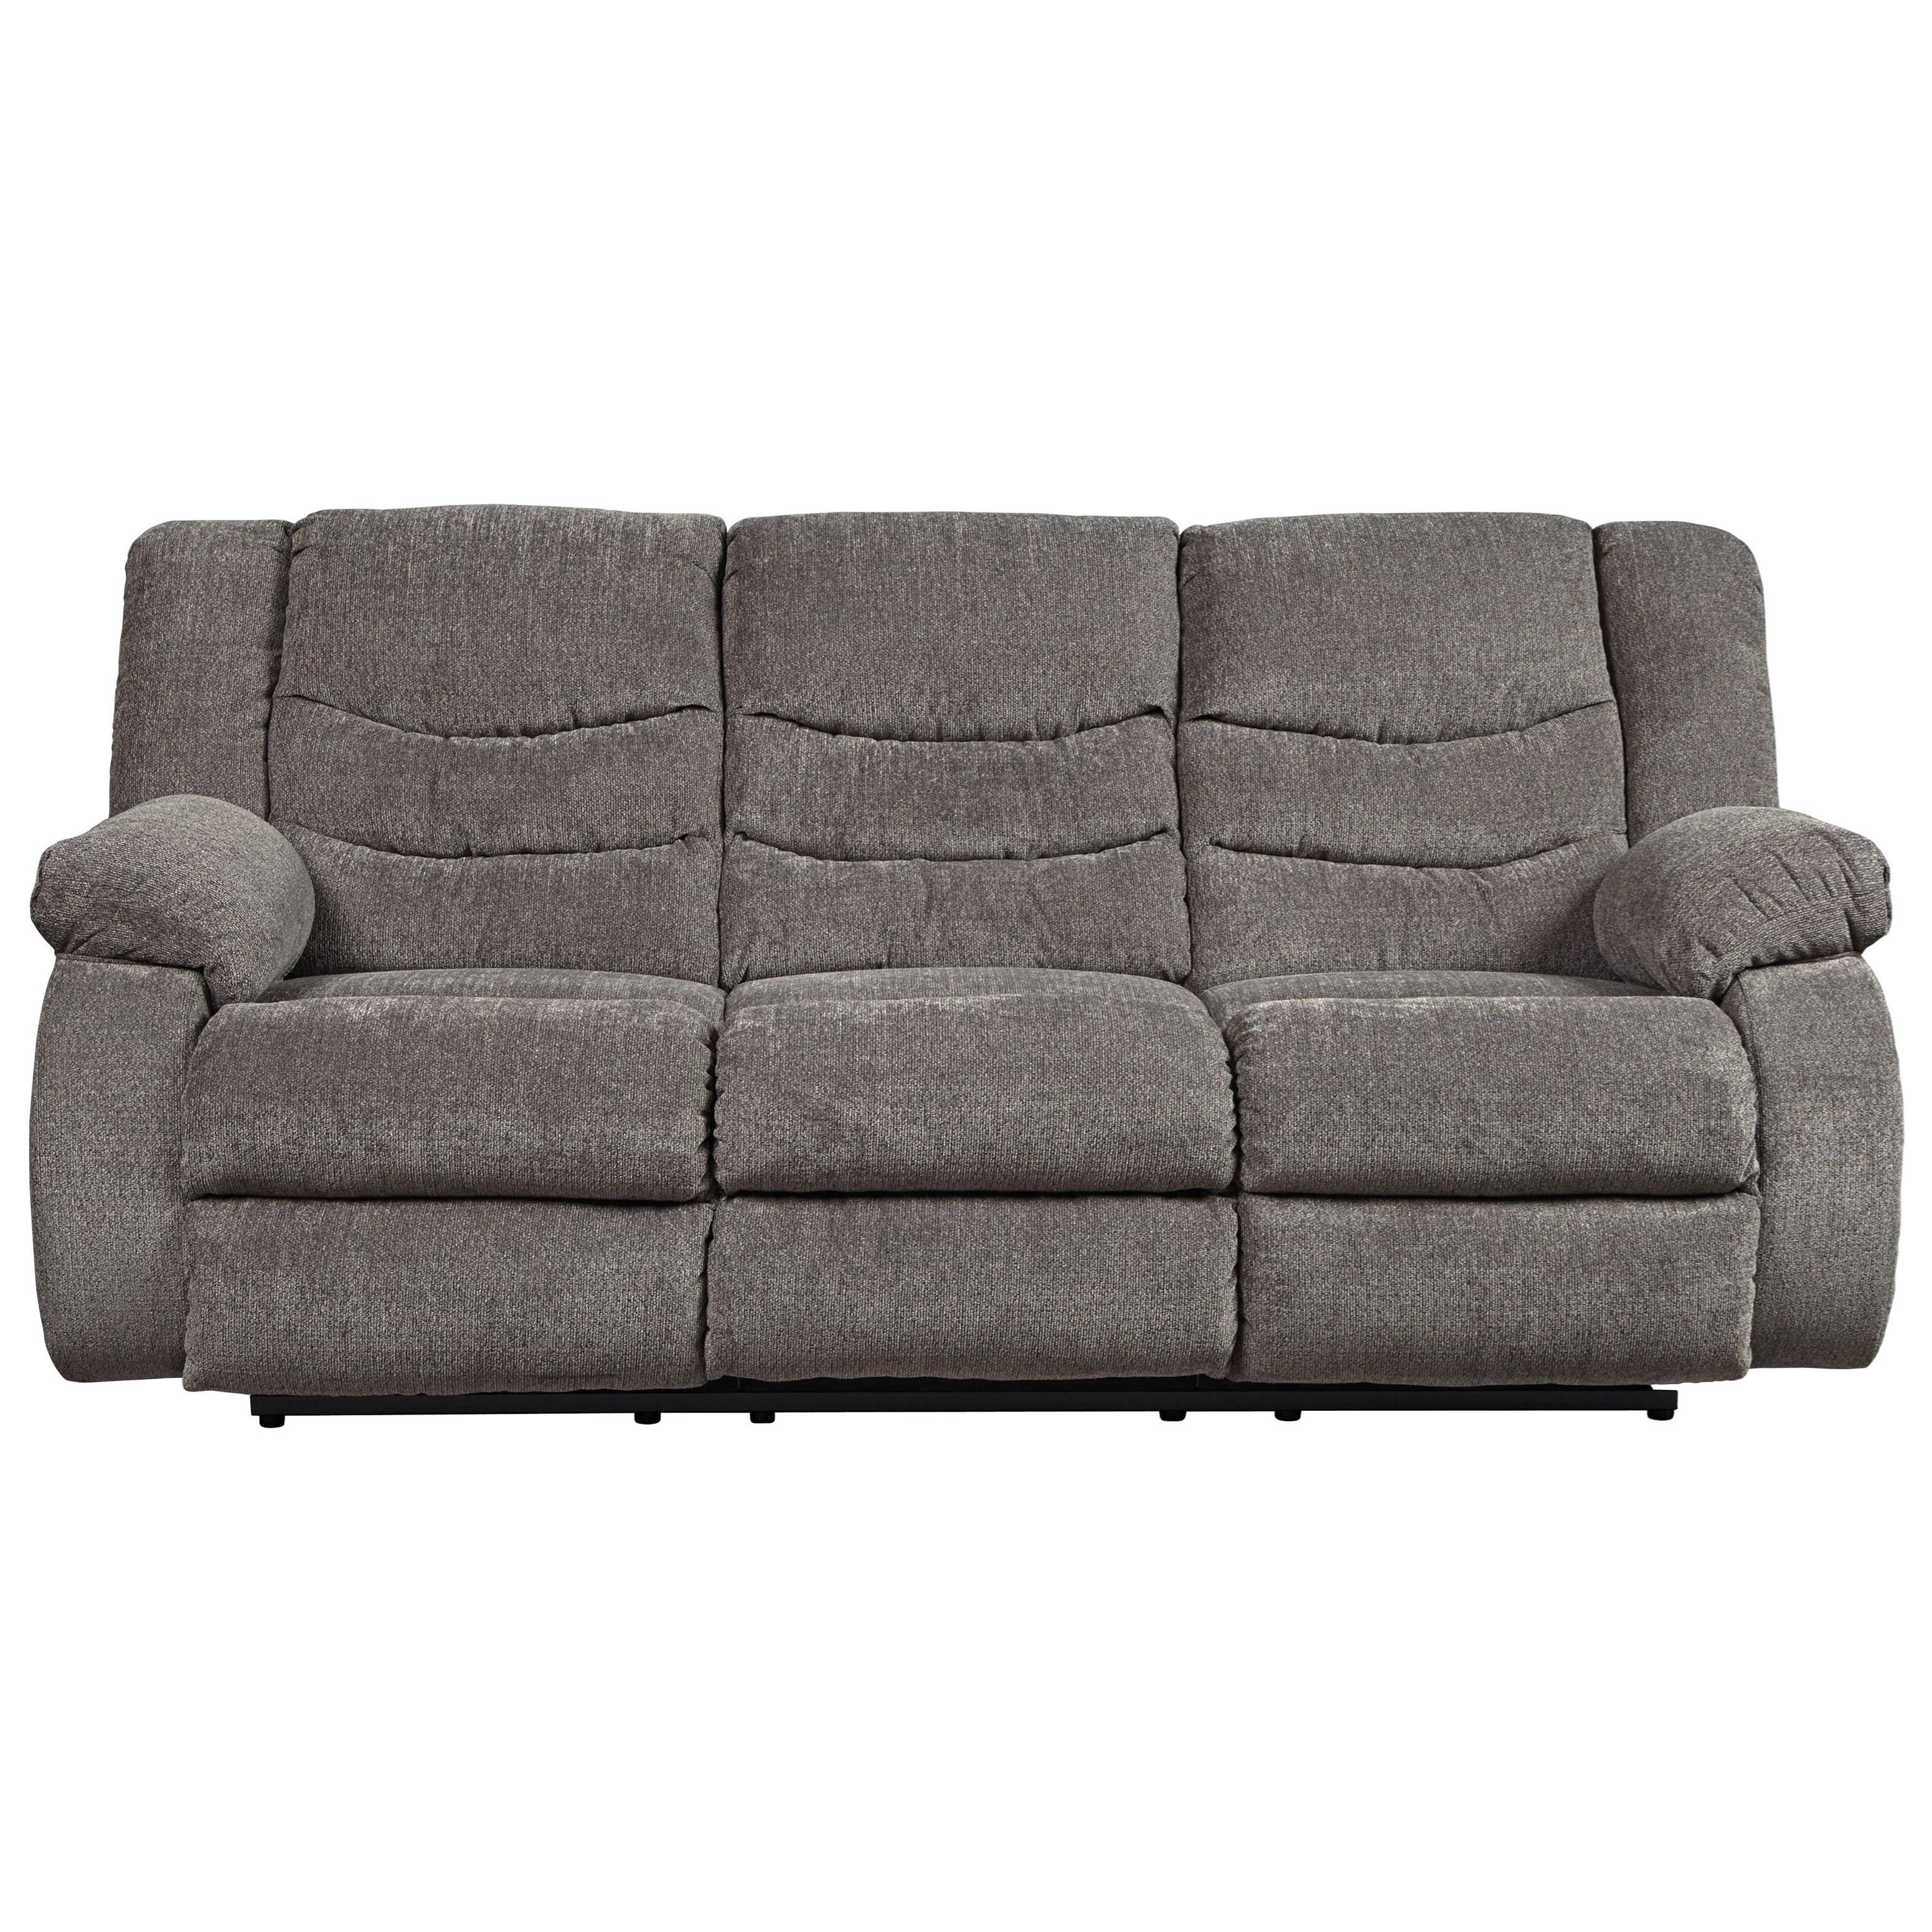 Signature design by ashley tulen contemporary reclining sofa boulevard home furnishings - Sofa reclinable ...